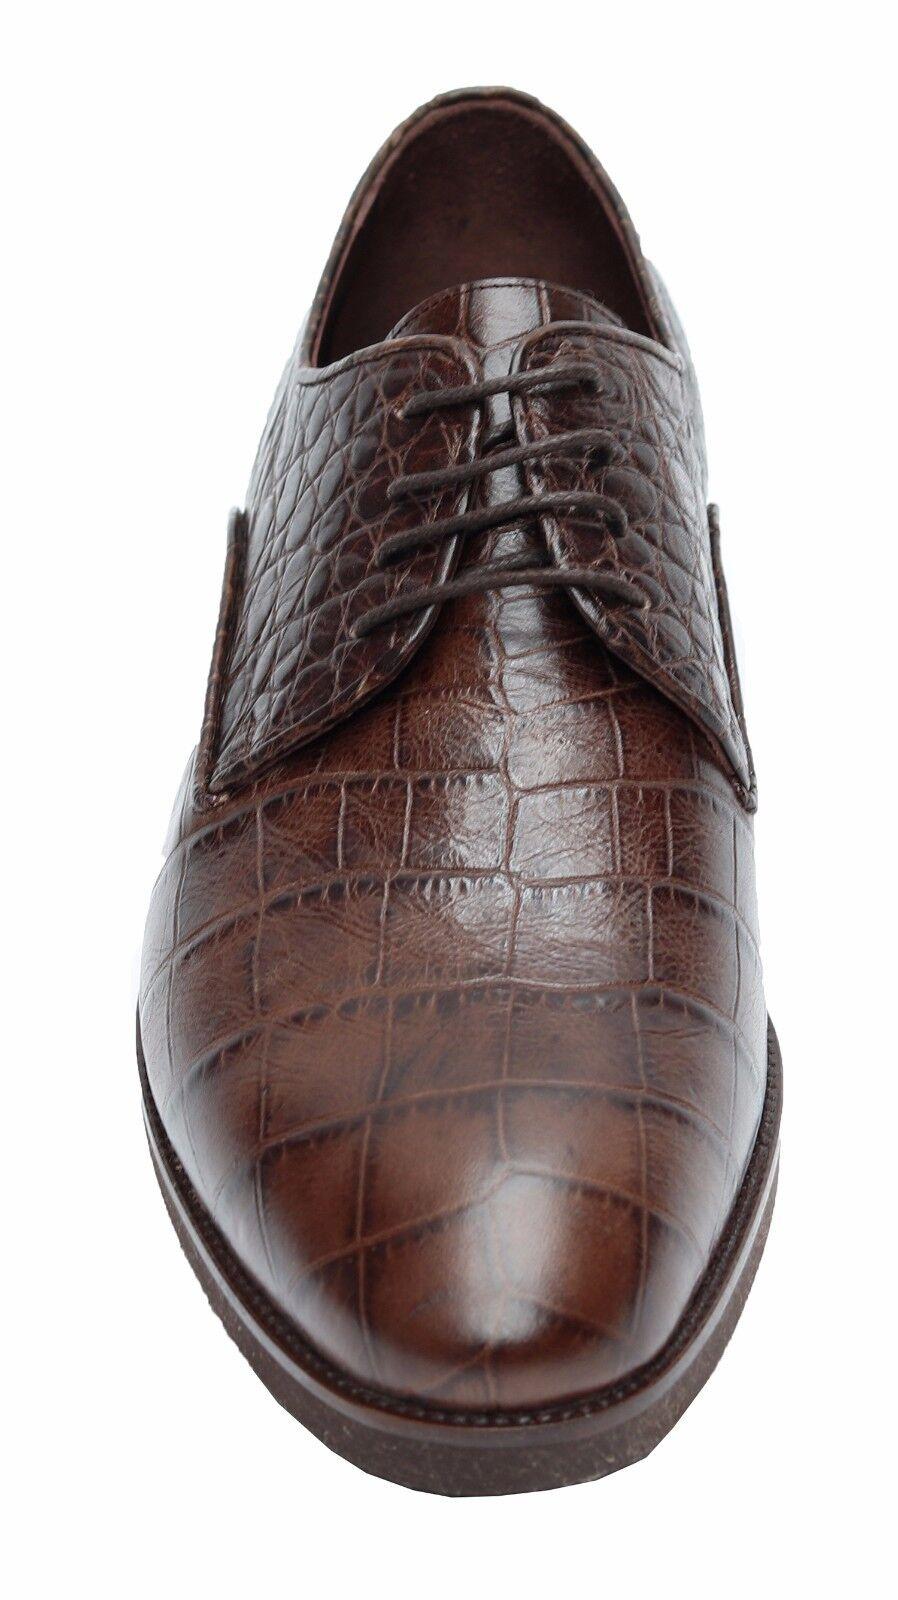 Cuero genuino zapatos caballero talla 43 marrón